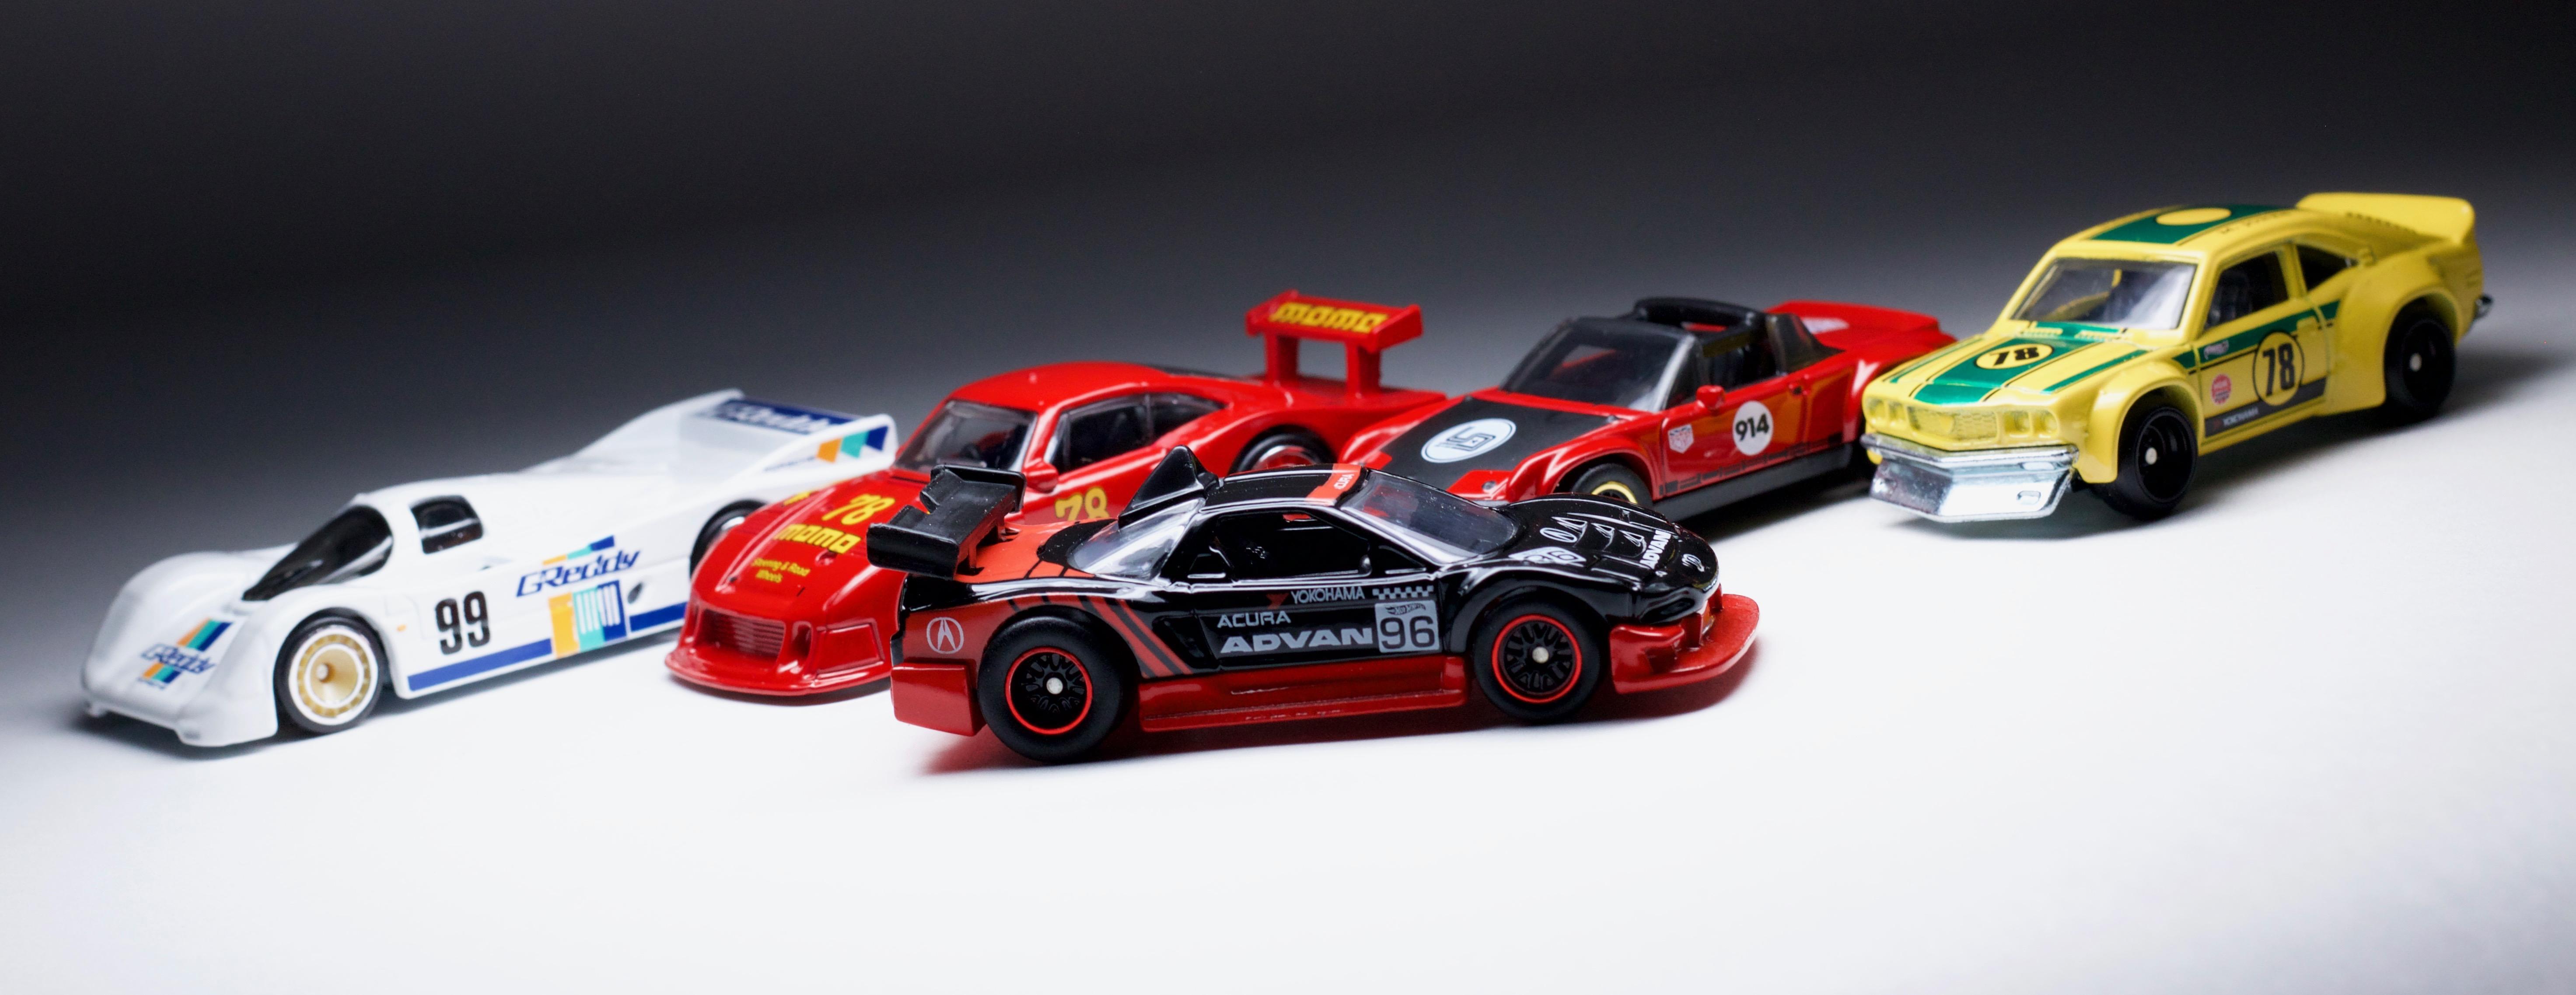 Hot Wheels Race Day Acura NSX